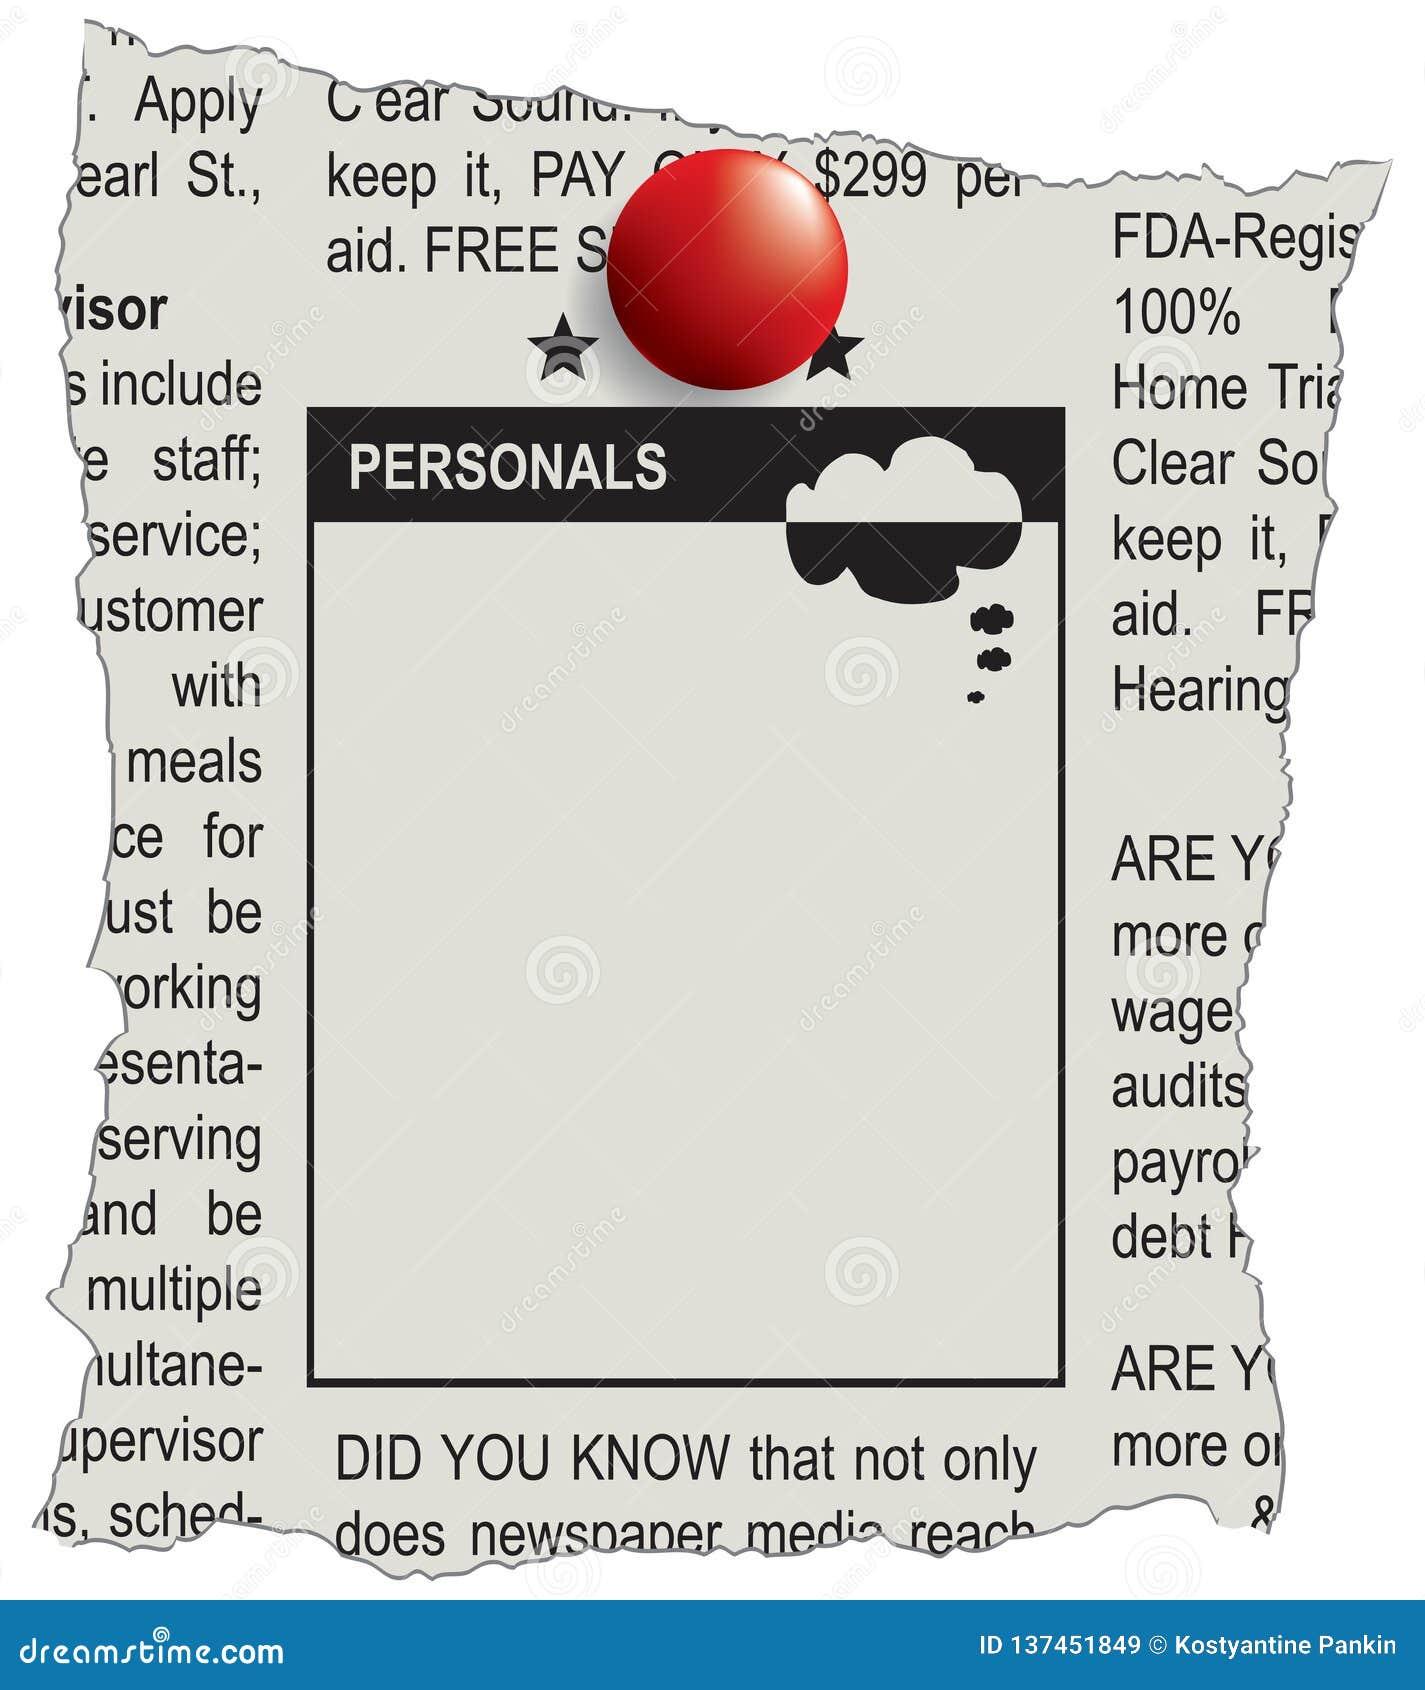 Personals Stock Illustrations – 40 Personals Stock